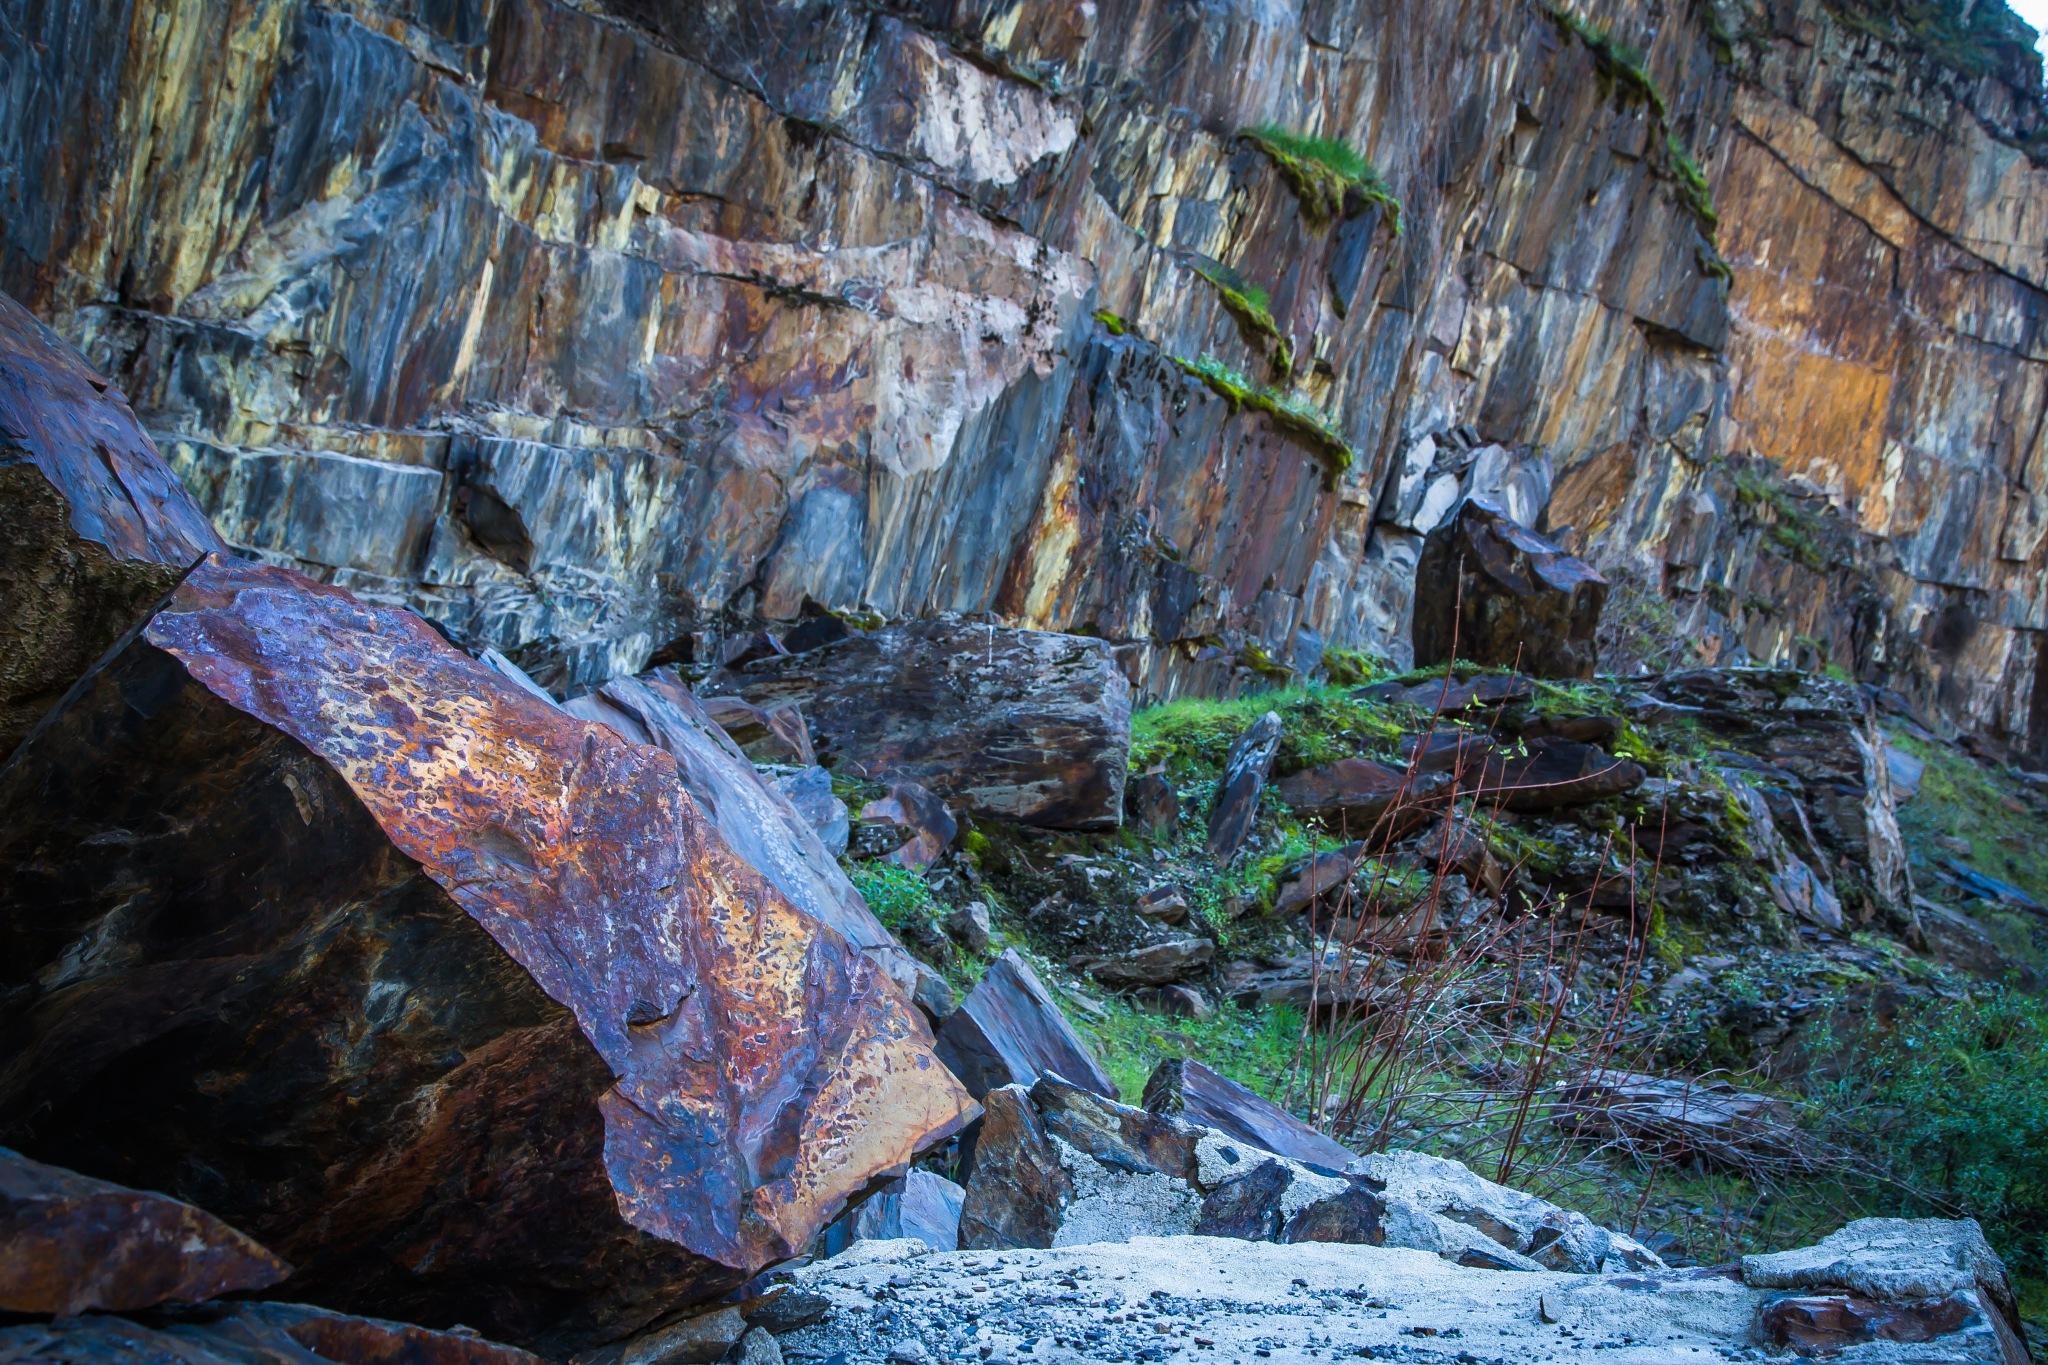 Yosemite, Rock Art by volkhard sturzbecher